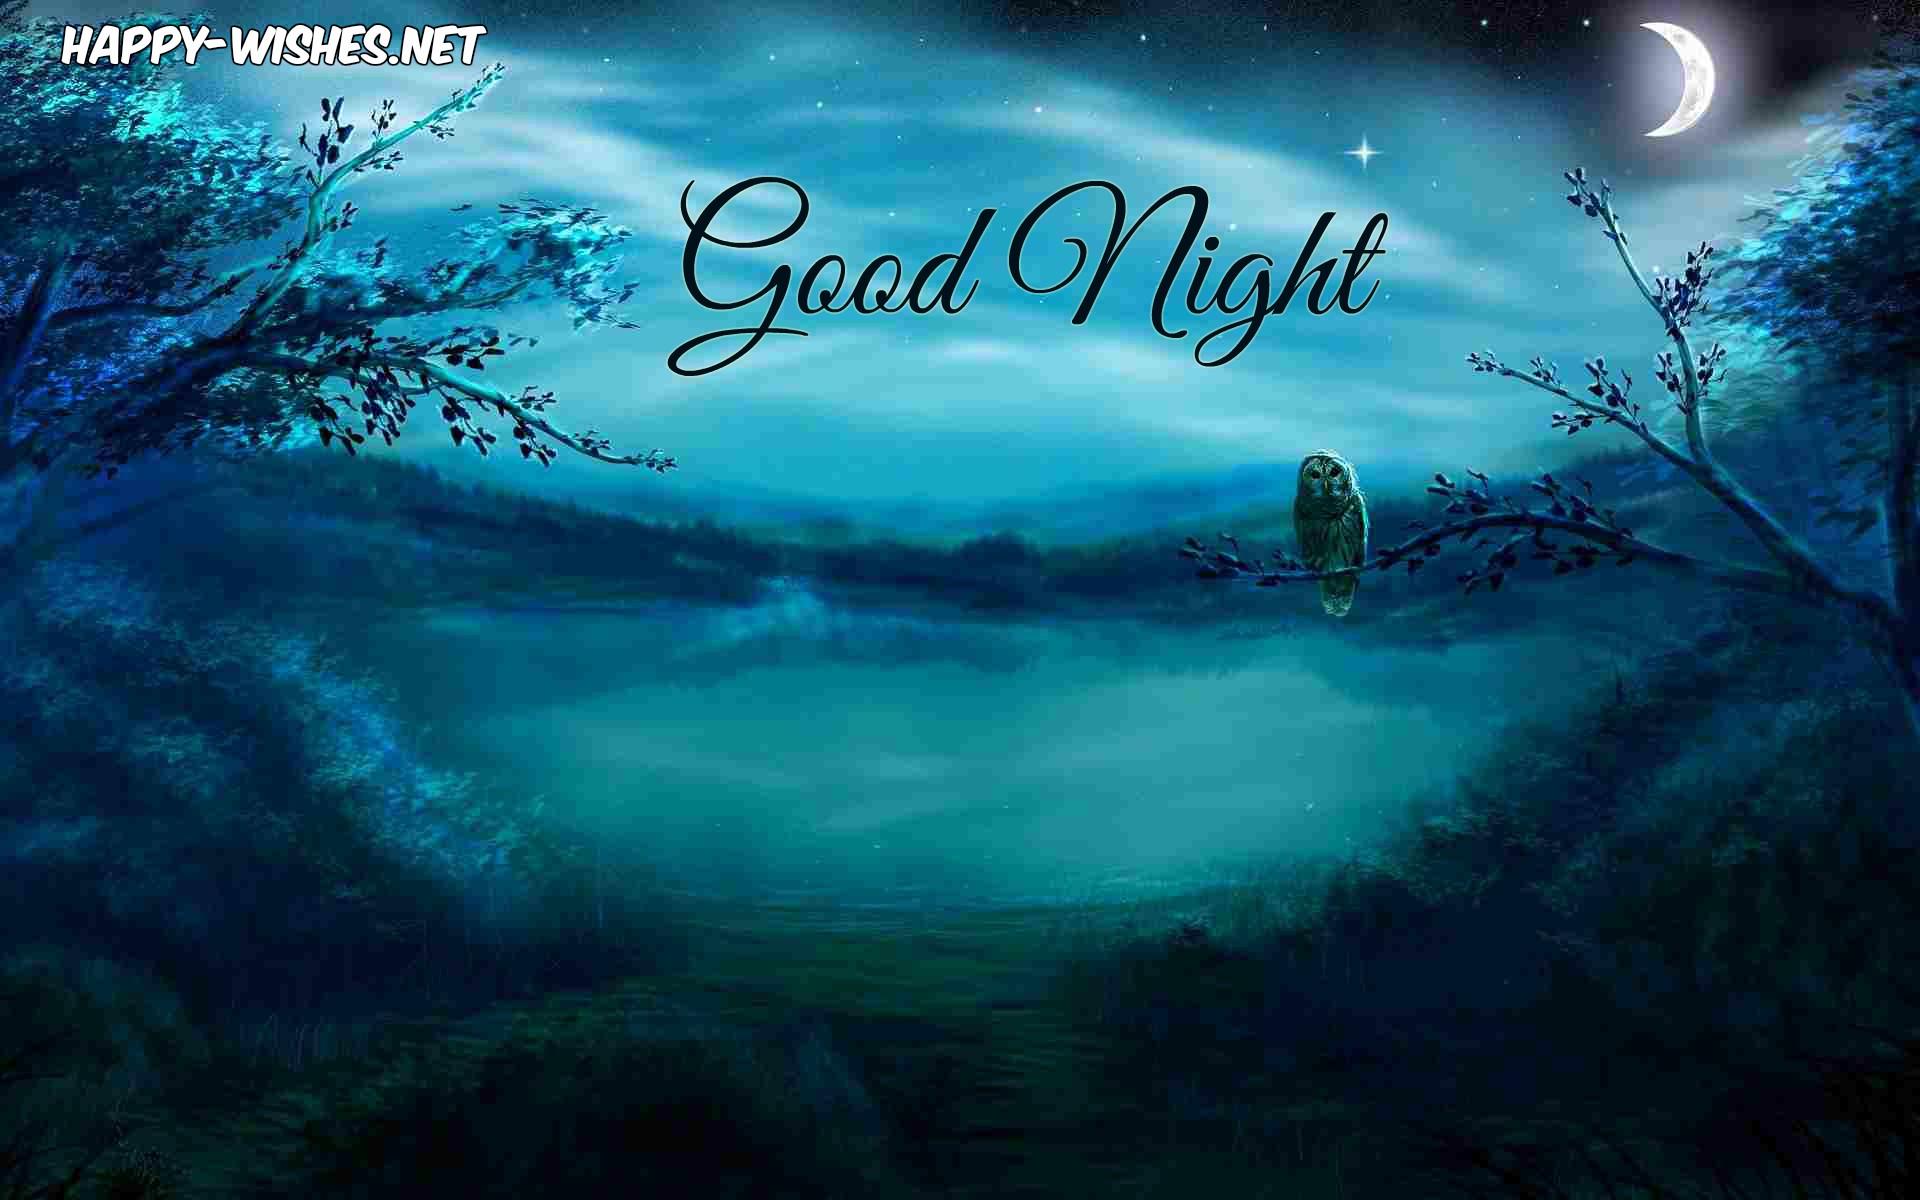 Beautiful night wishes